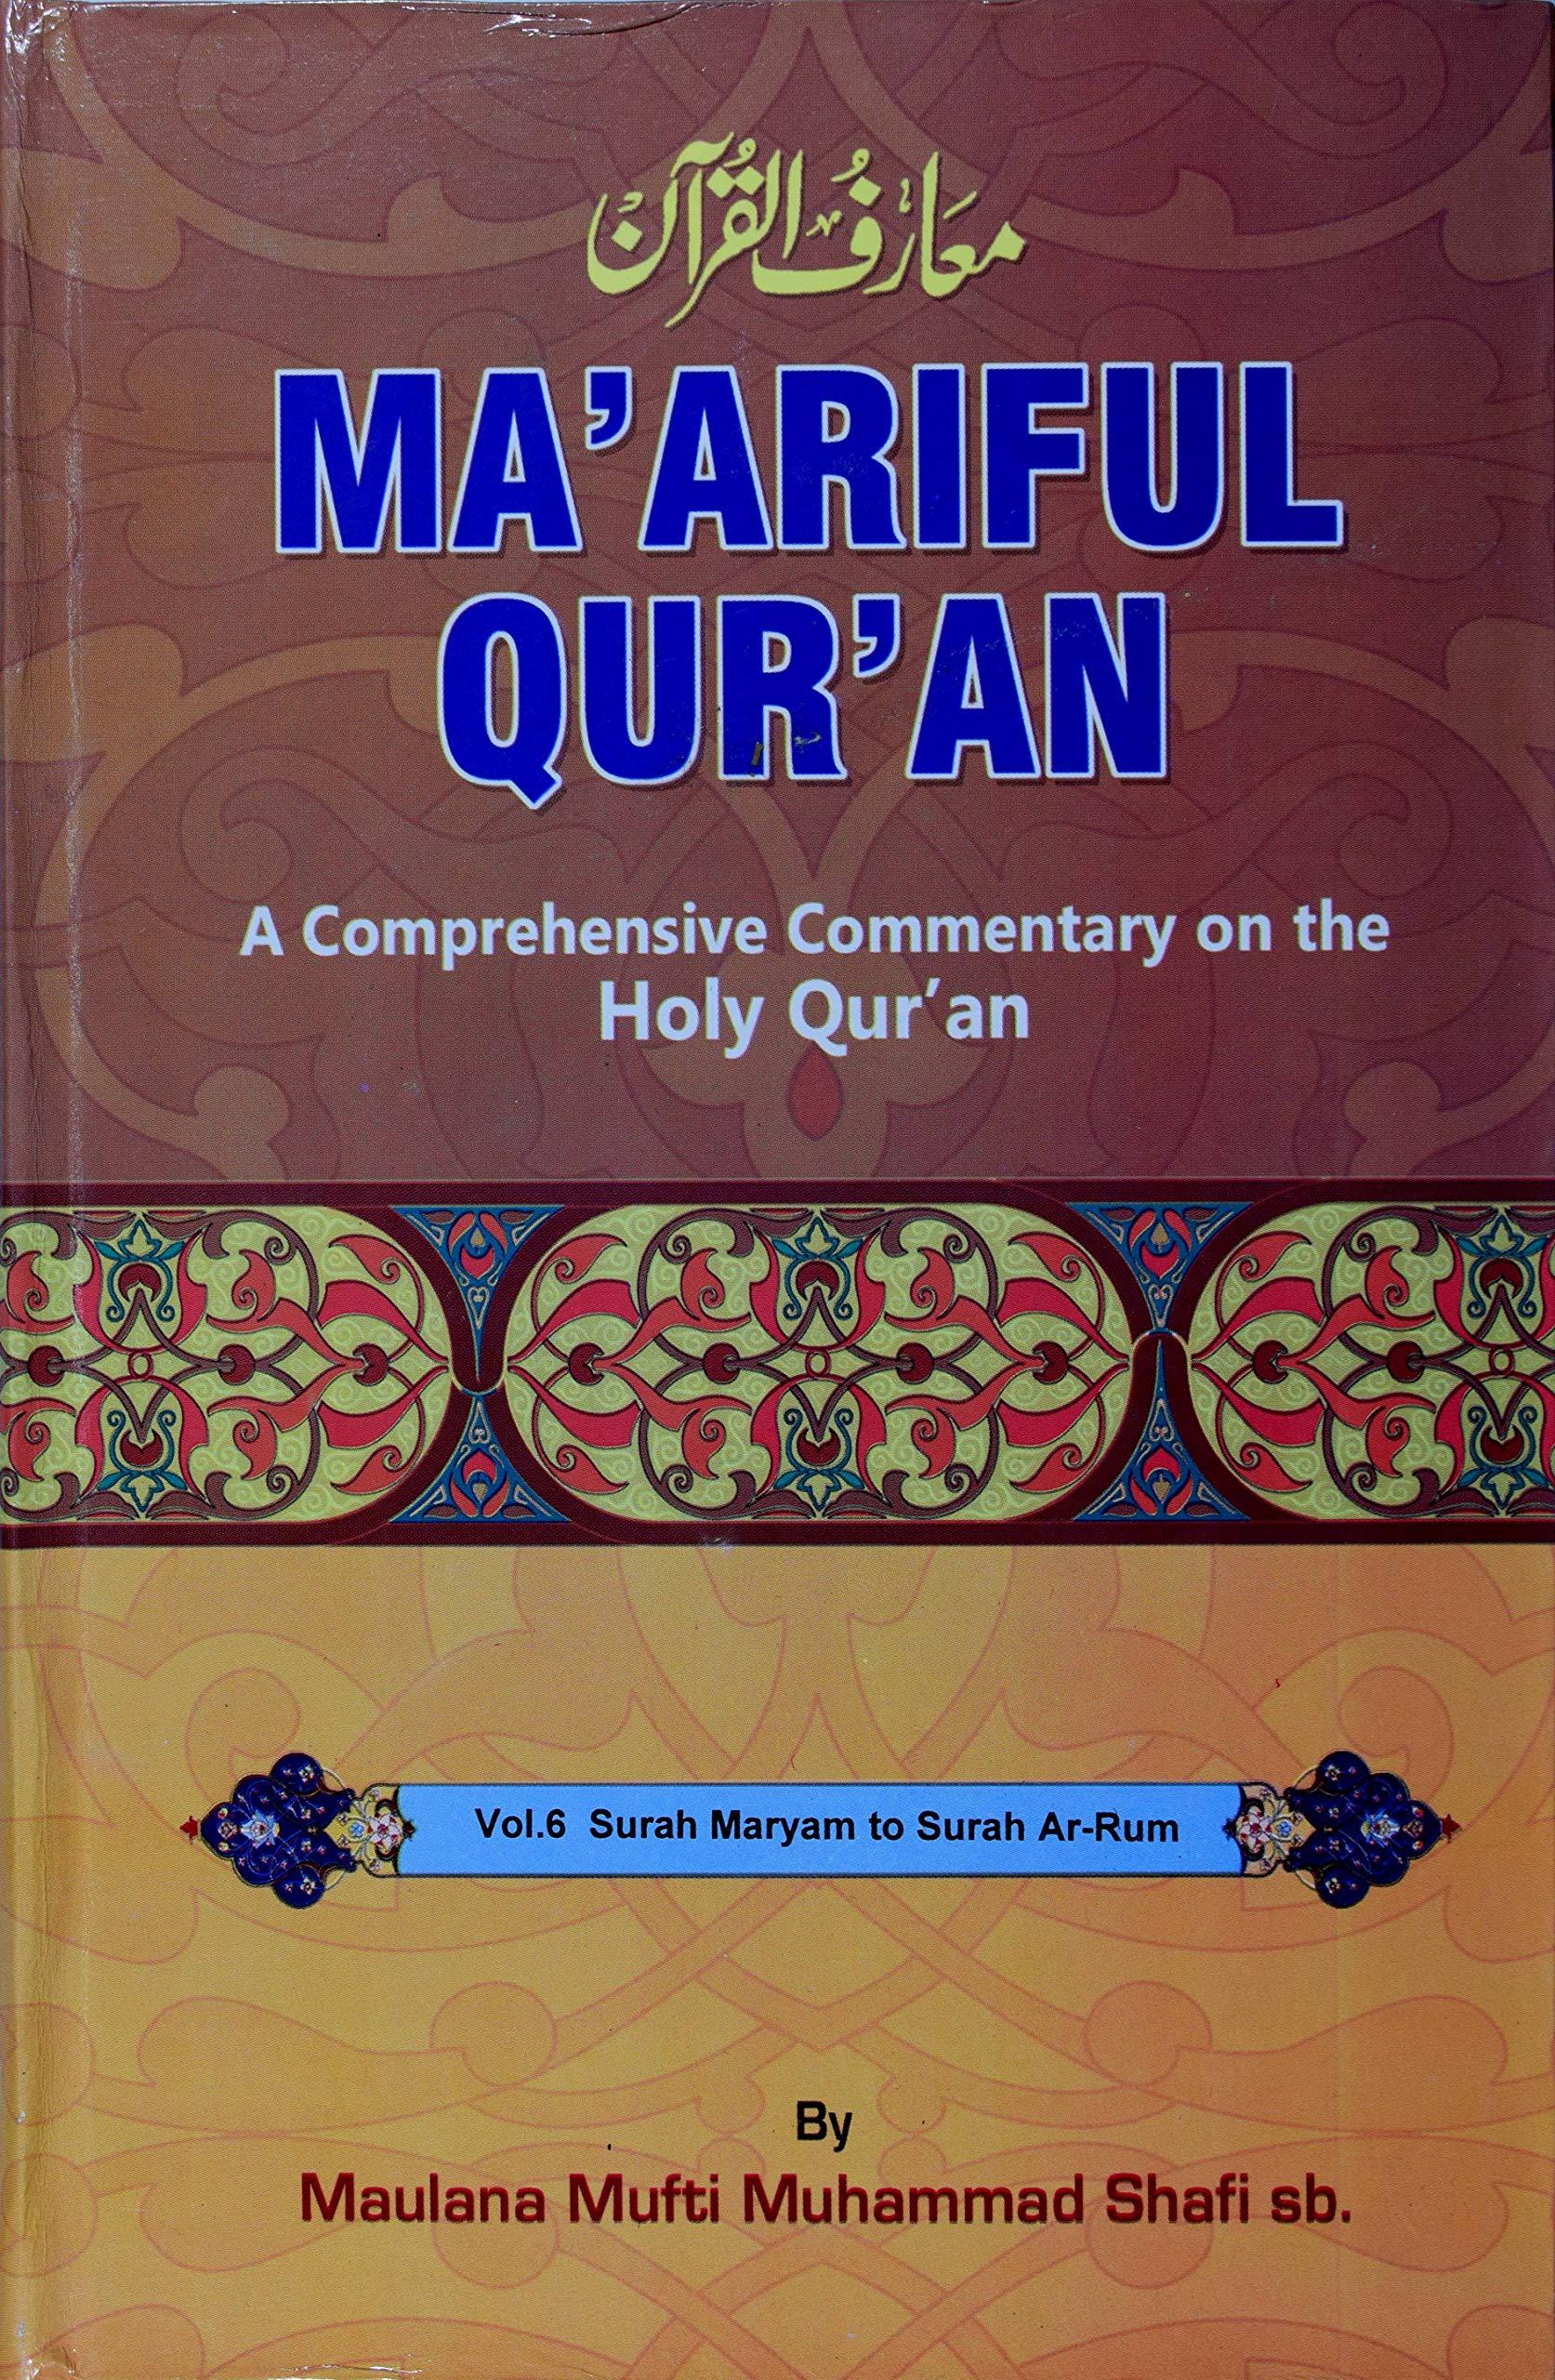 Buy MaAriful Quran Vol1 -8 [Arabic -English] Comprehensive